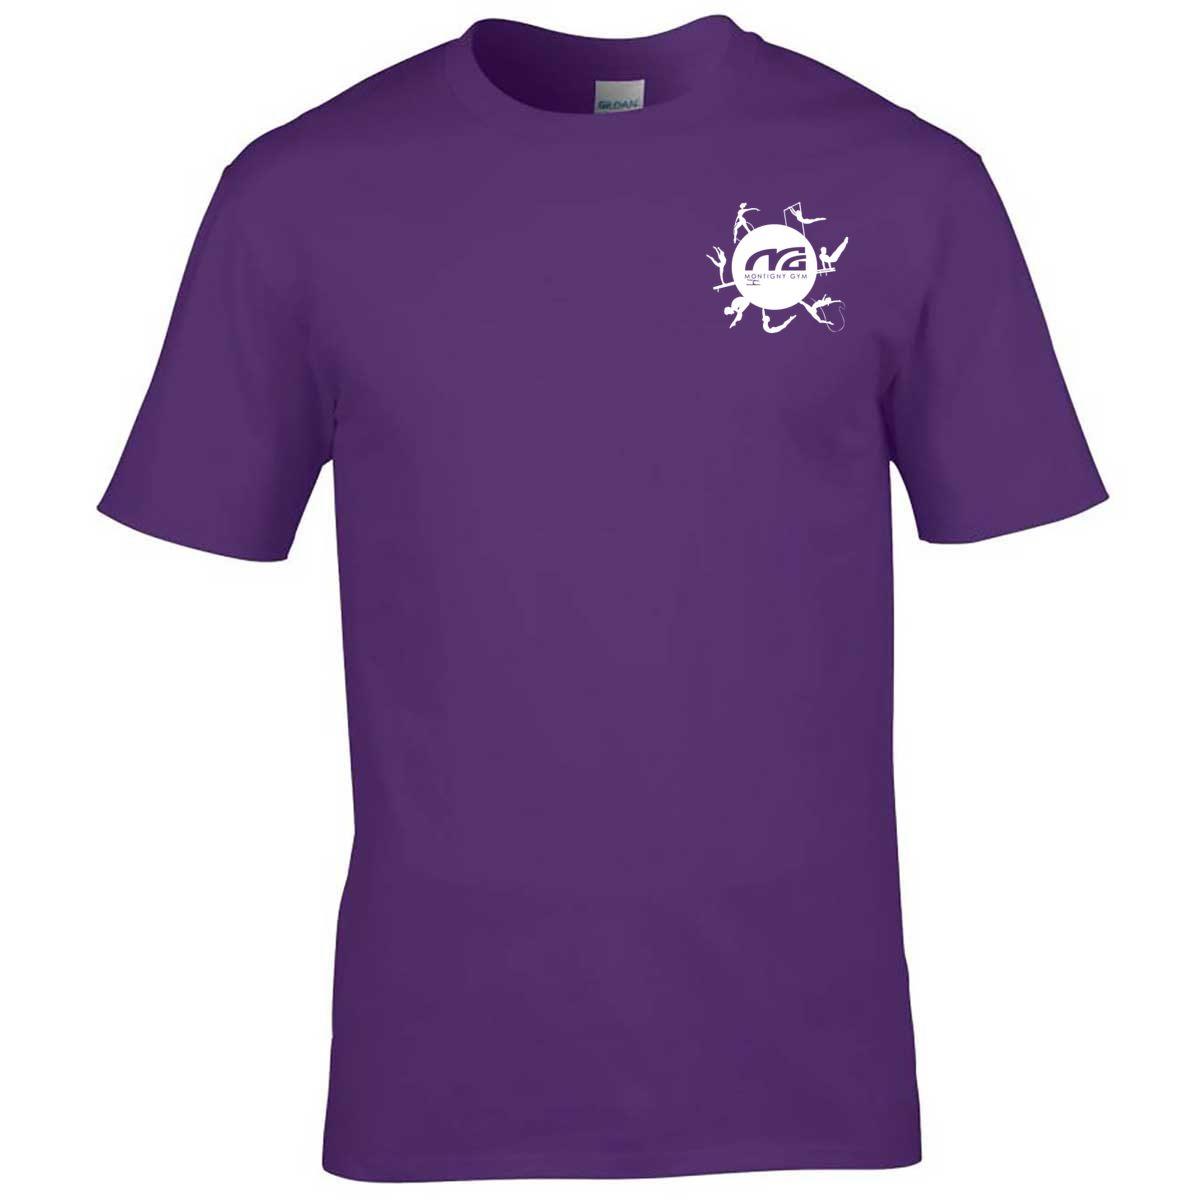 01_gd008_violet--0-0--e2781588-4ea7-420a-be14-4d2499cc03b4